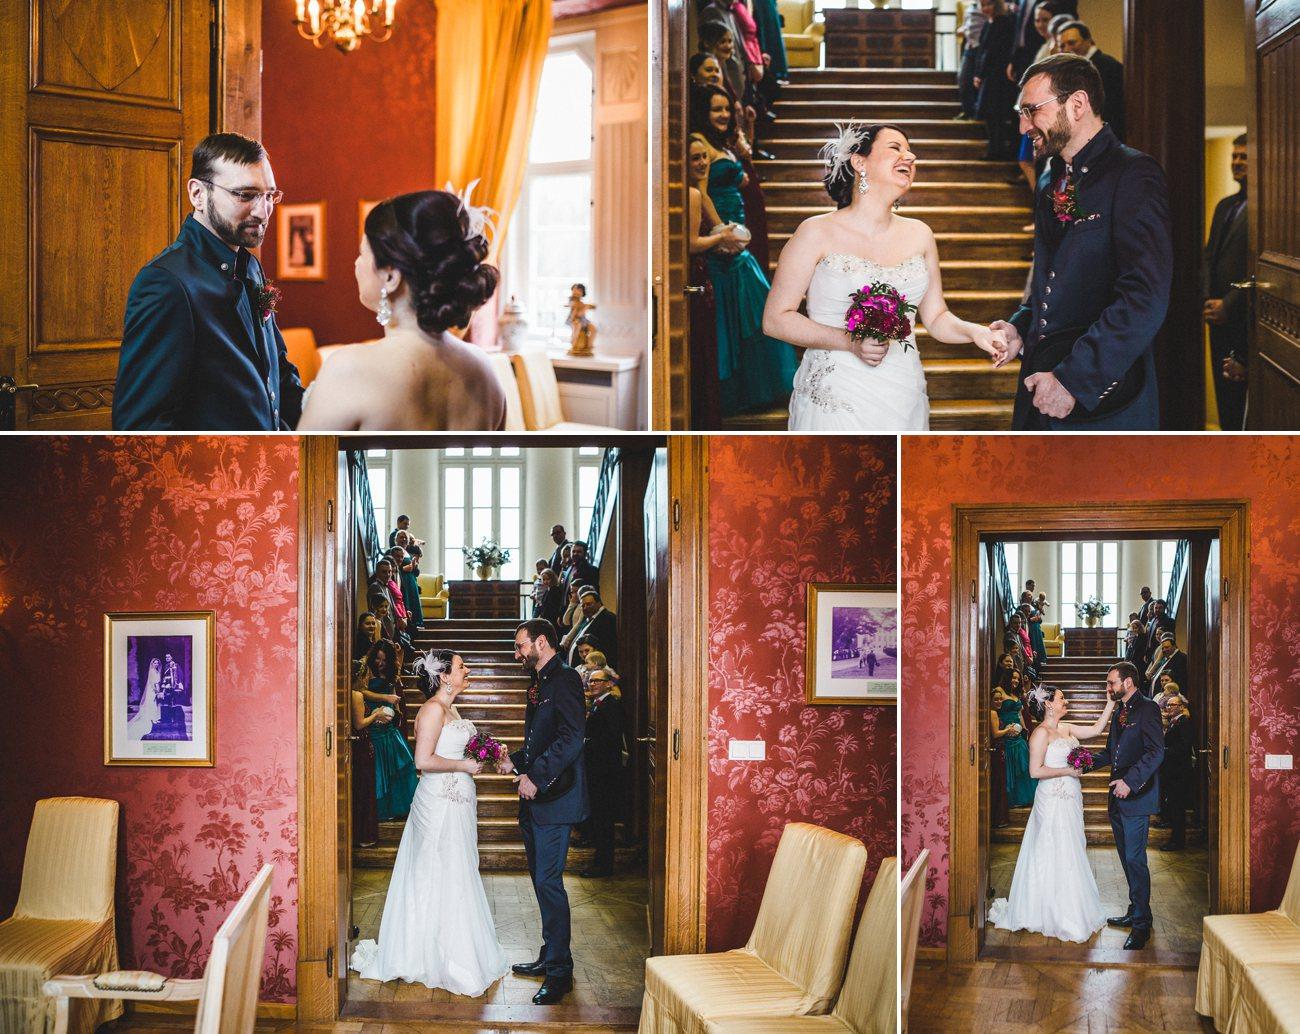 Hochzeitsfotograf_Schloss_Luebbenau 20